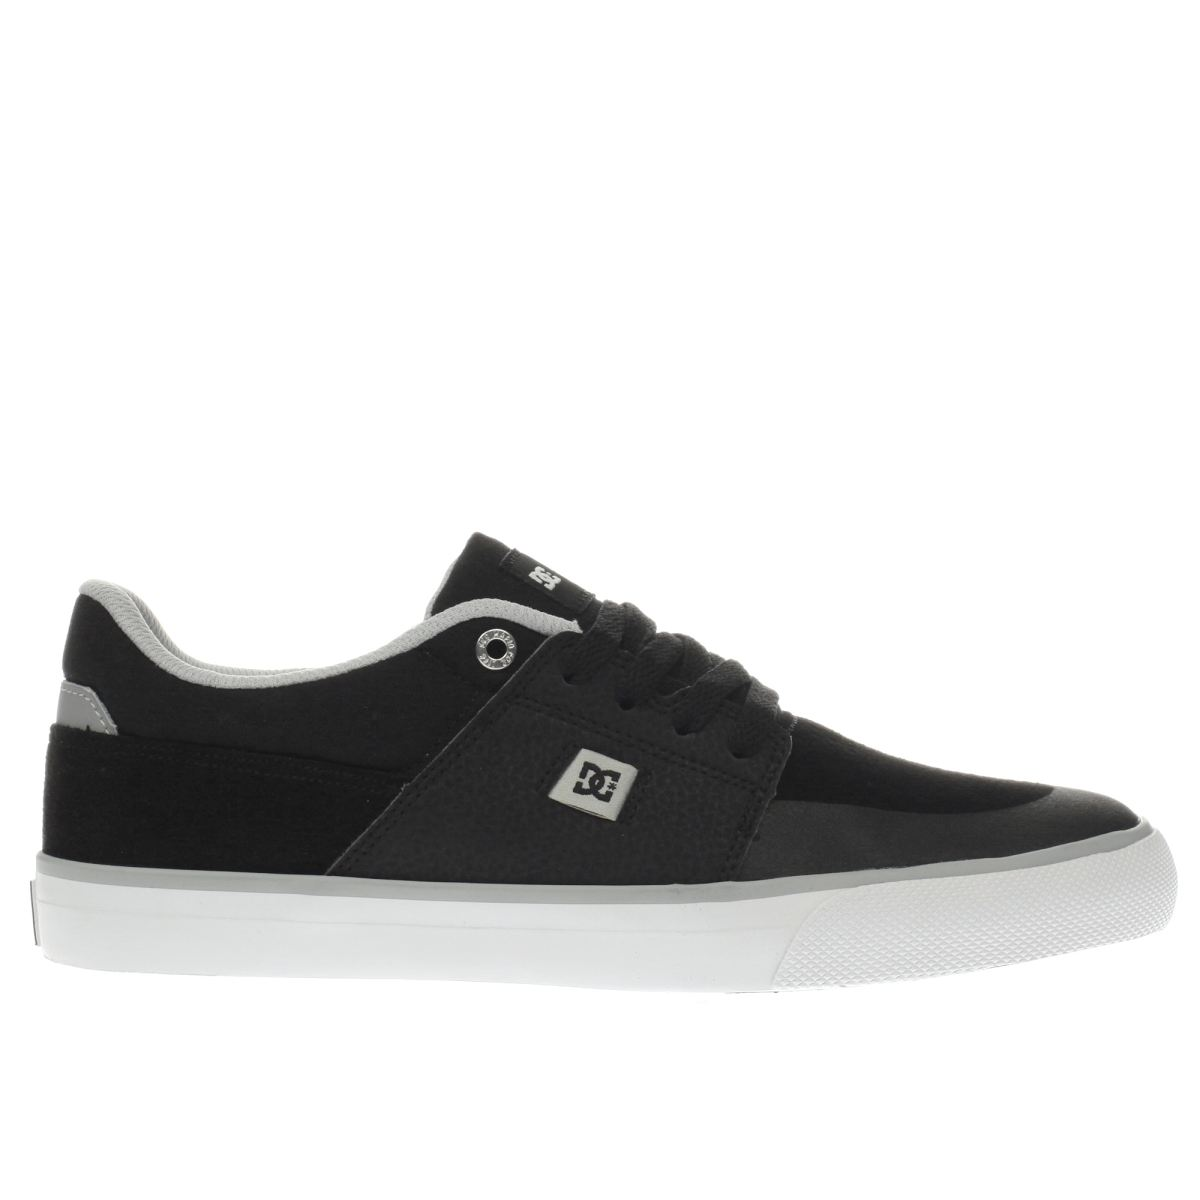 dc shoes Dc Shoes Black & Grey Wes Kremer Trainers